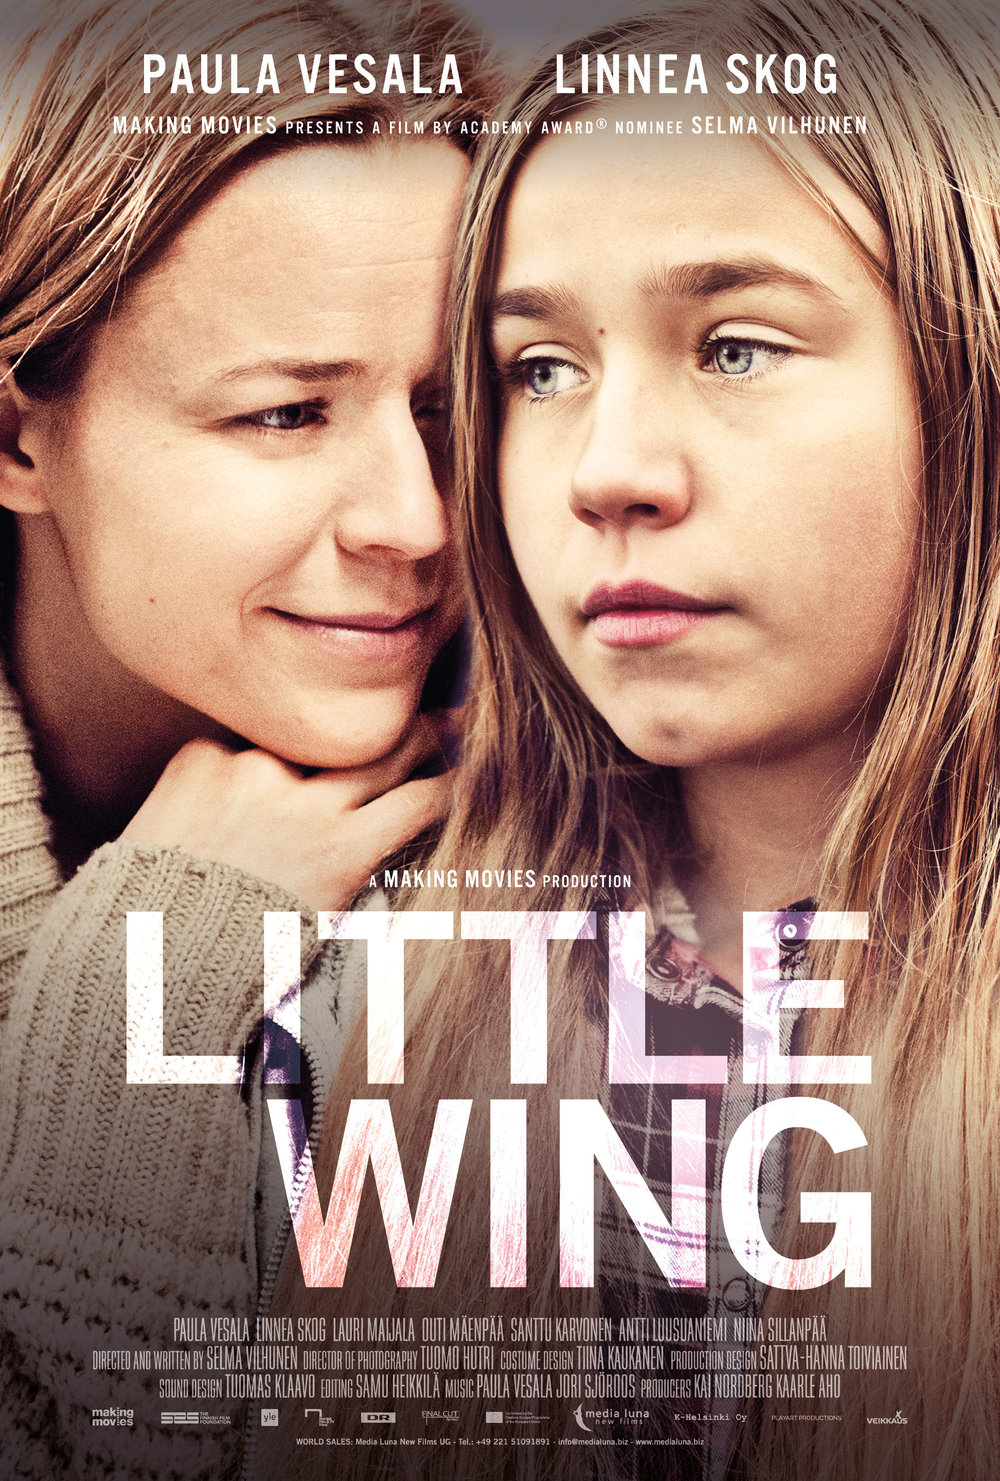 Little Wing To Screen At Tiff September 6 2016 By Mauricio Gonzalez Aranda